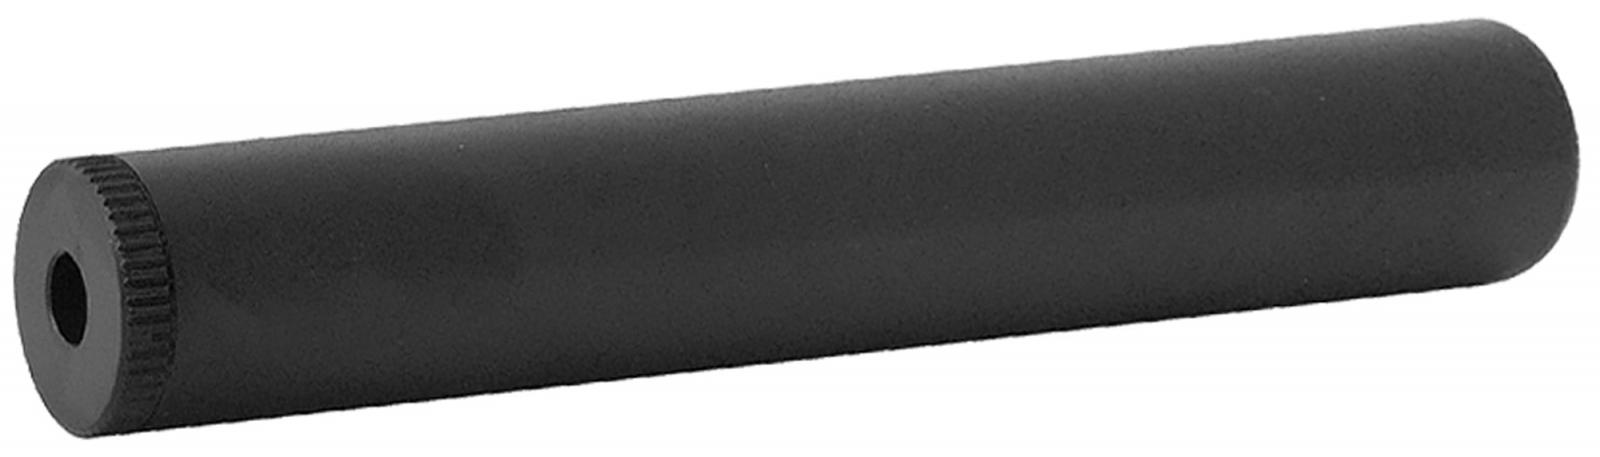 Silencieux STILL N°3 calibre 22 Lr. 1/2x20 UNF L. 17.5 cm